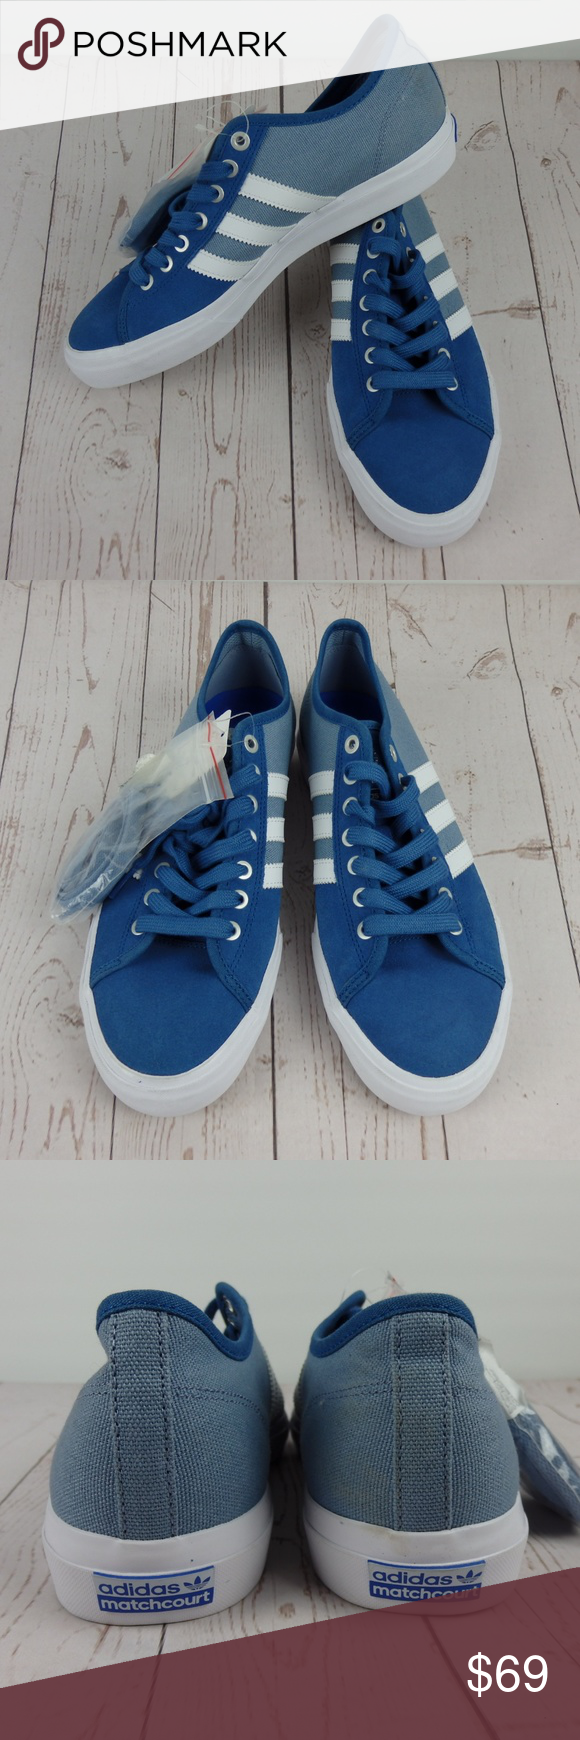 adidas matchcourt rx pattinare scarpe taglia 9 nwt pinterest pulito i piedi